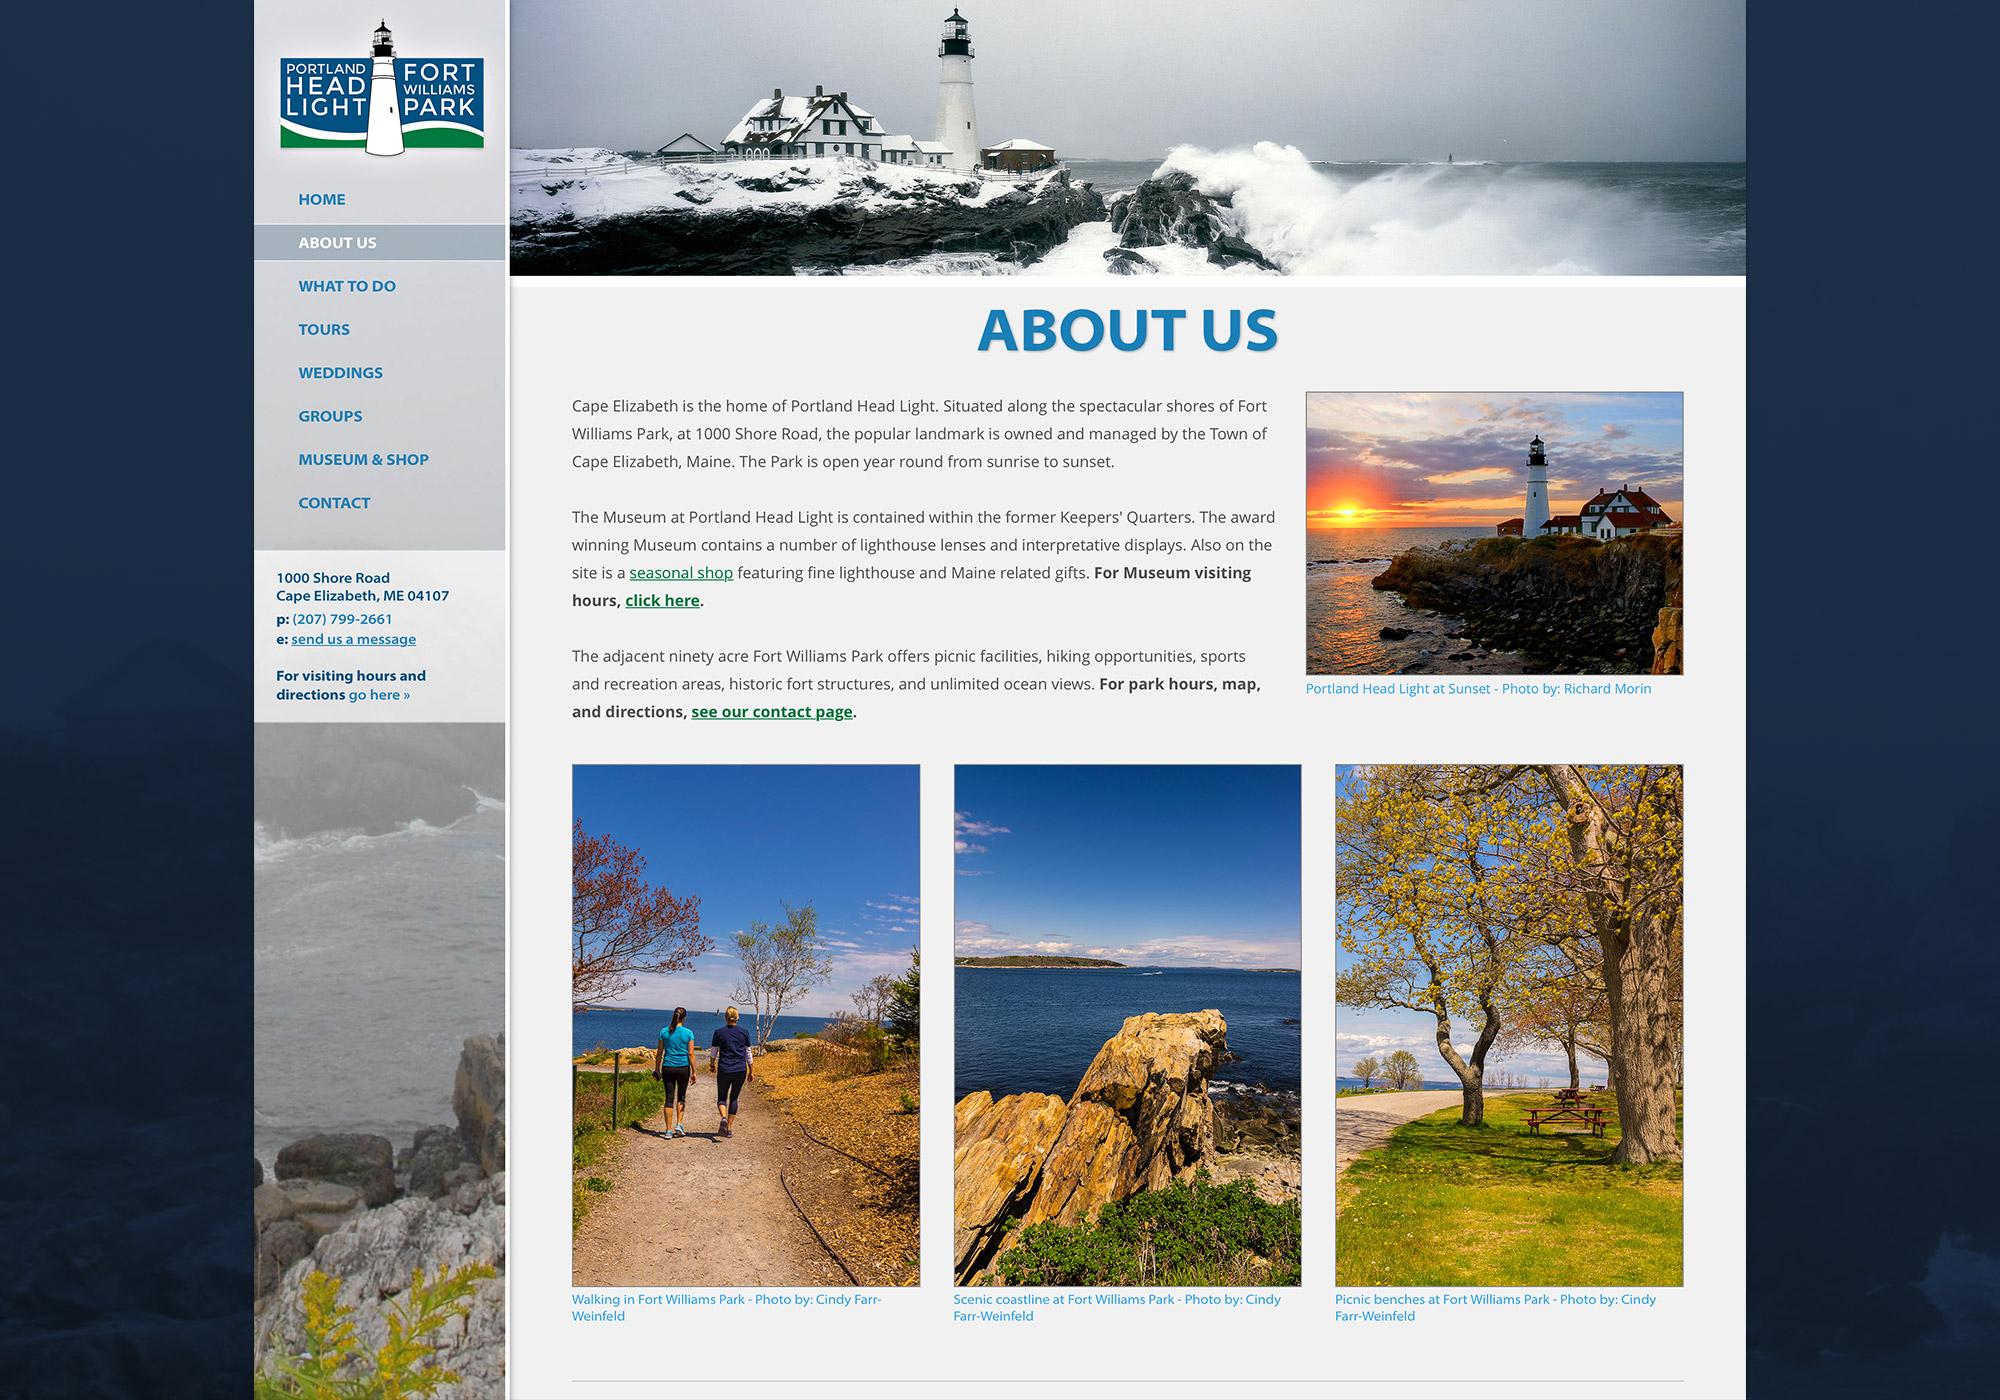 SlickFish, a Portland, Maine website design company, created an original, custom website for the Portland Head Light and Fort Williams Park.